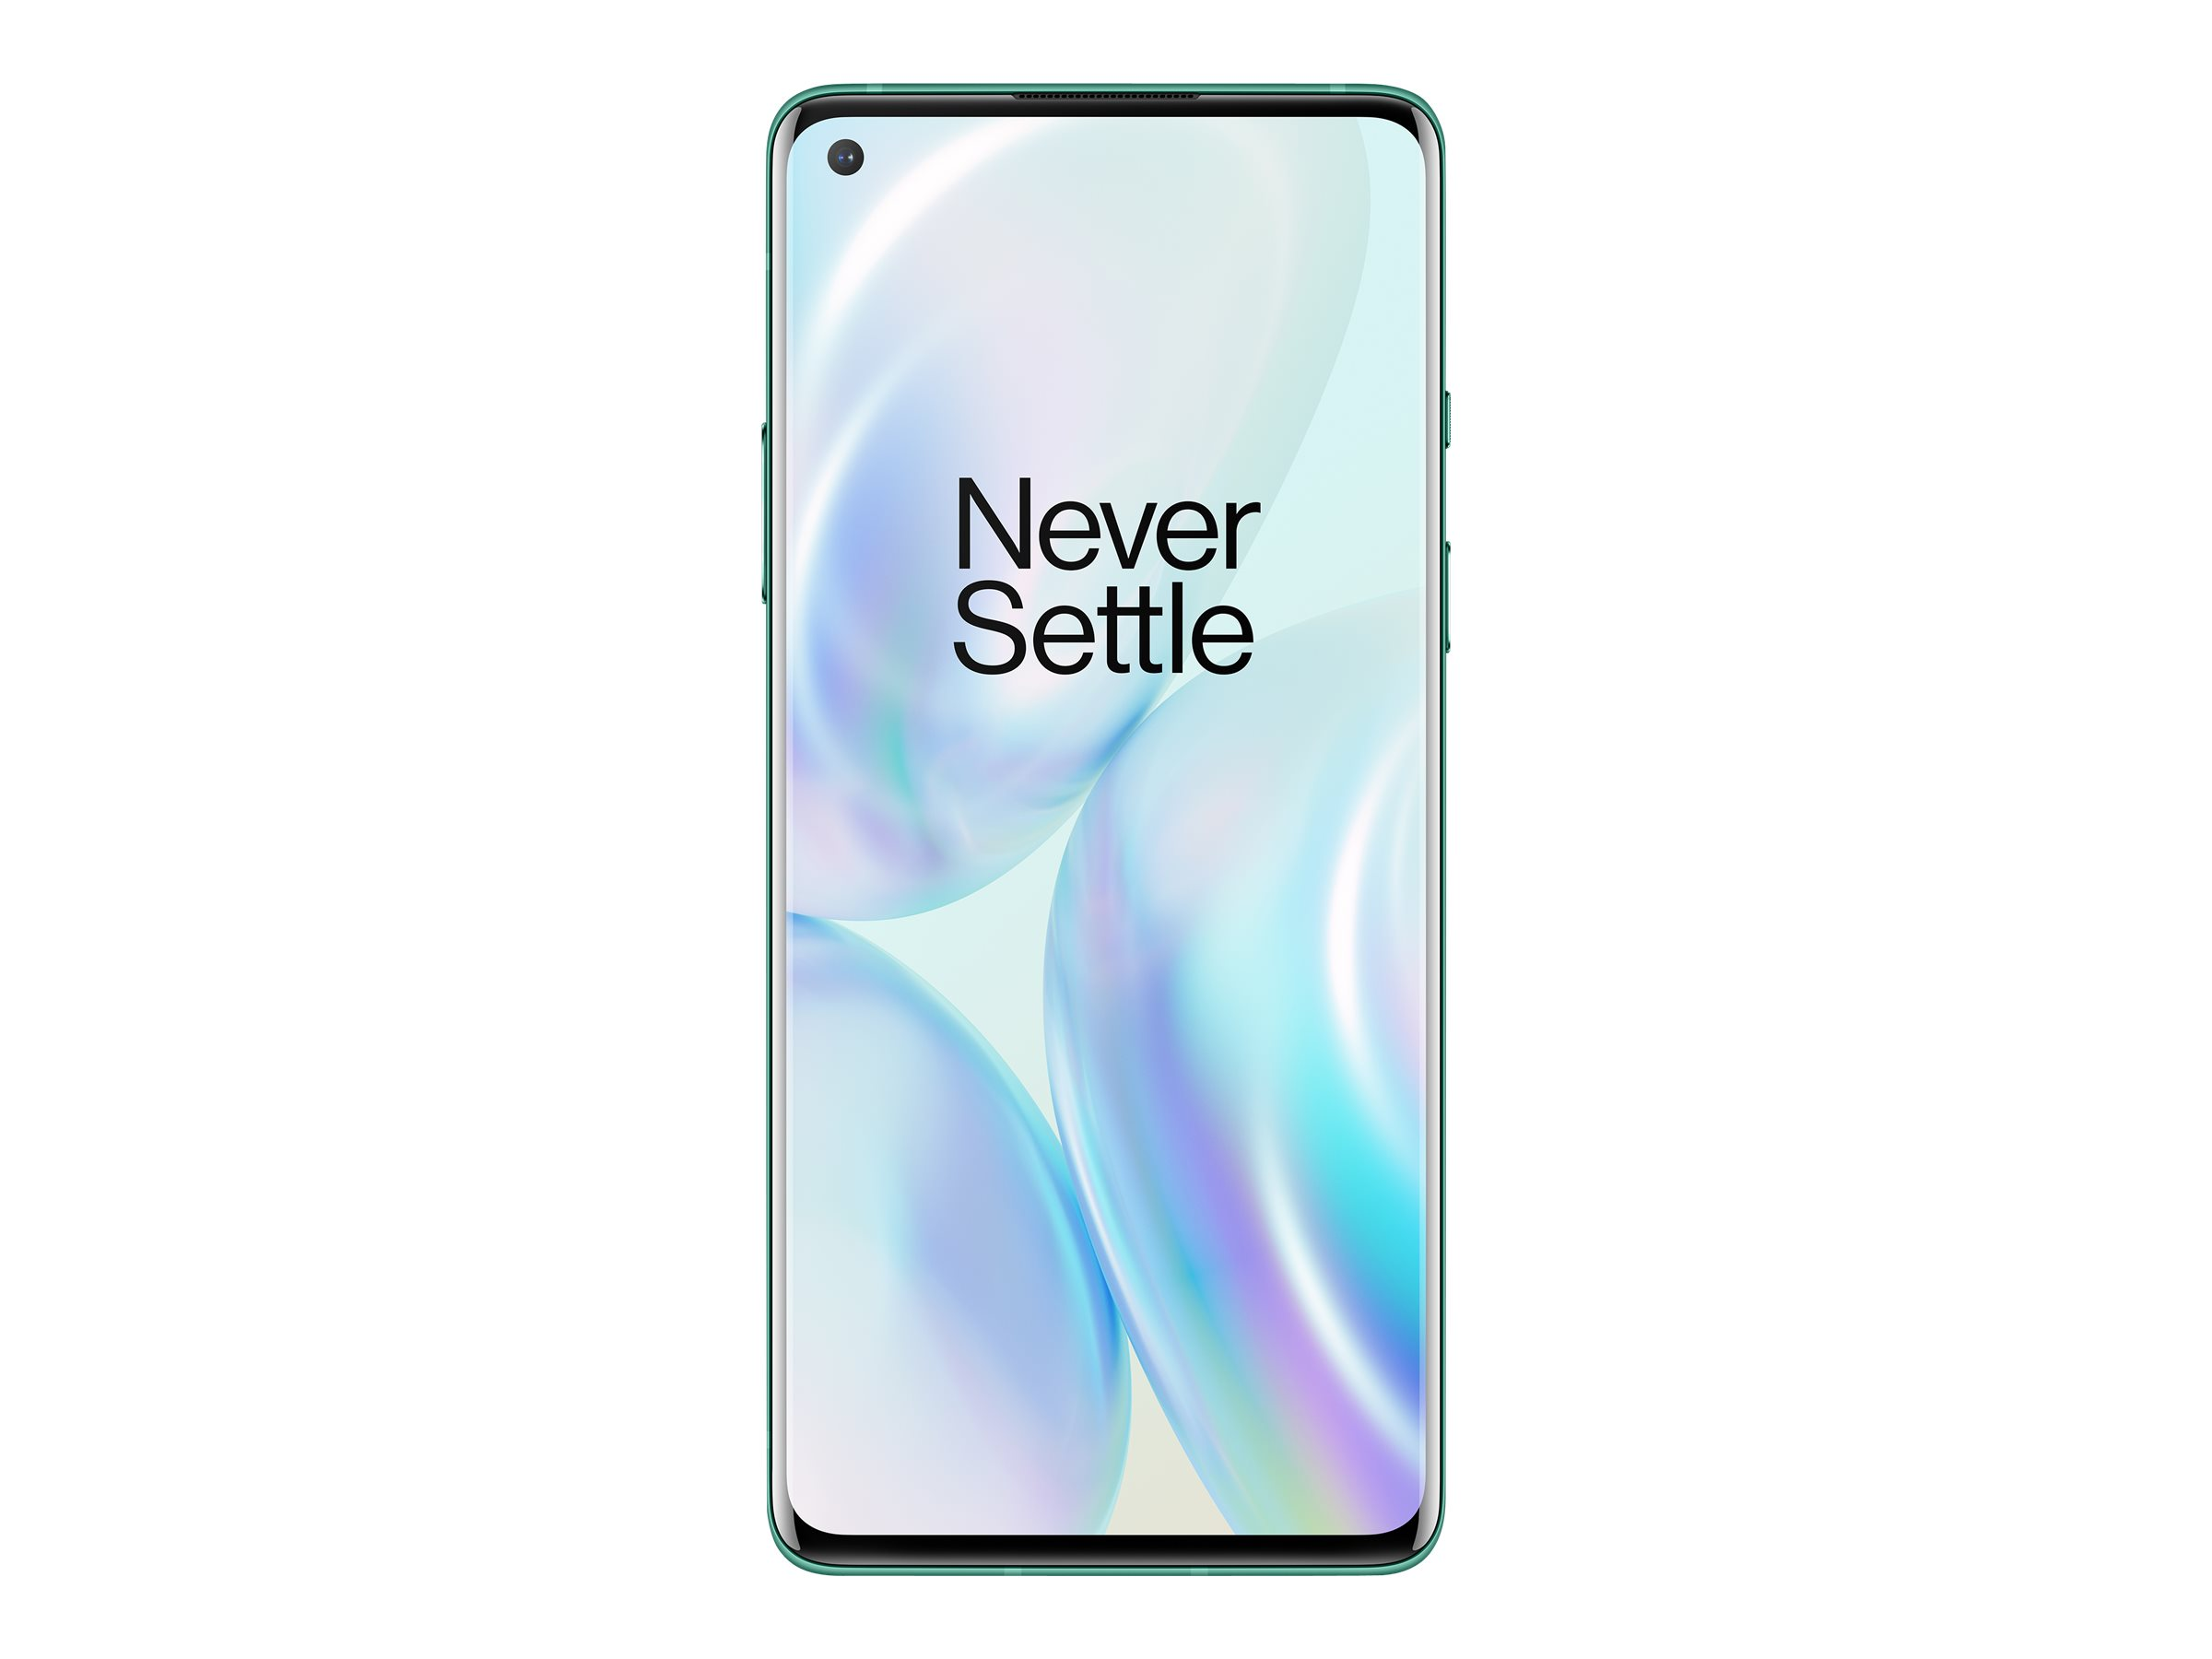 "Vorschau: OnePlus 8 - Smartphone - Dual-SIM - 5G NR - 128 GB - CDMA / GSM - 6.55"" - 2400 x 1080 Pixel (402 ppi (Pixel pro Zoll))"